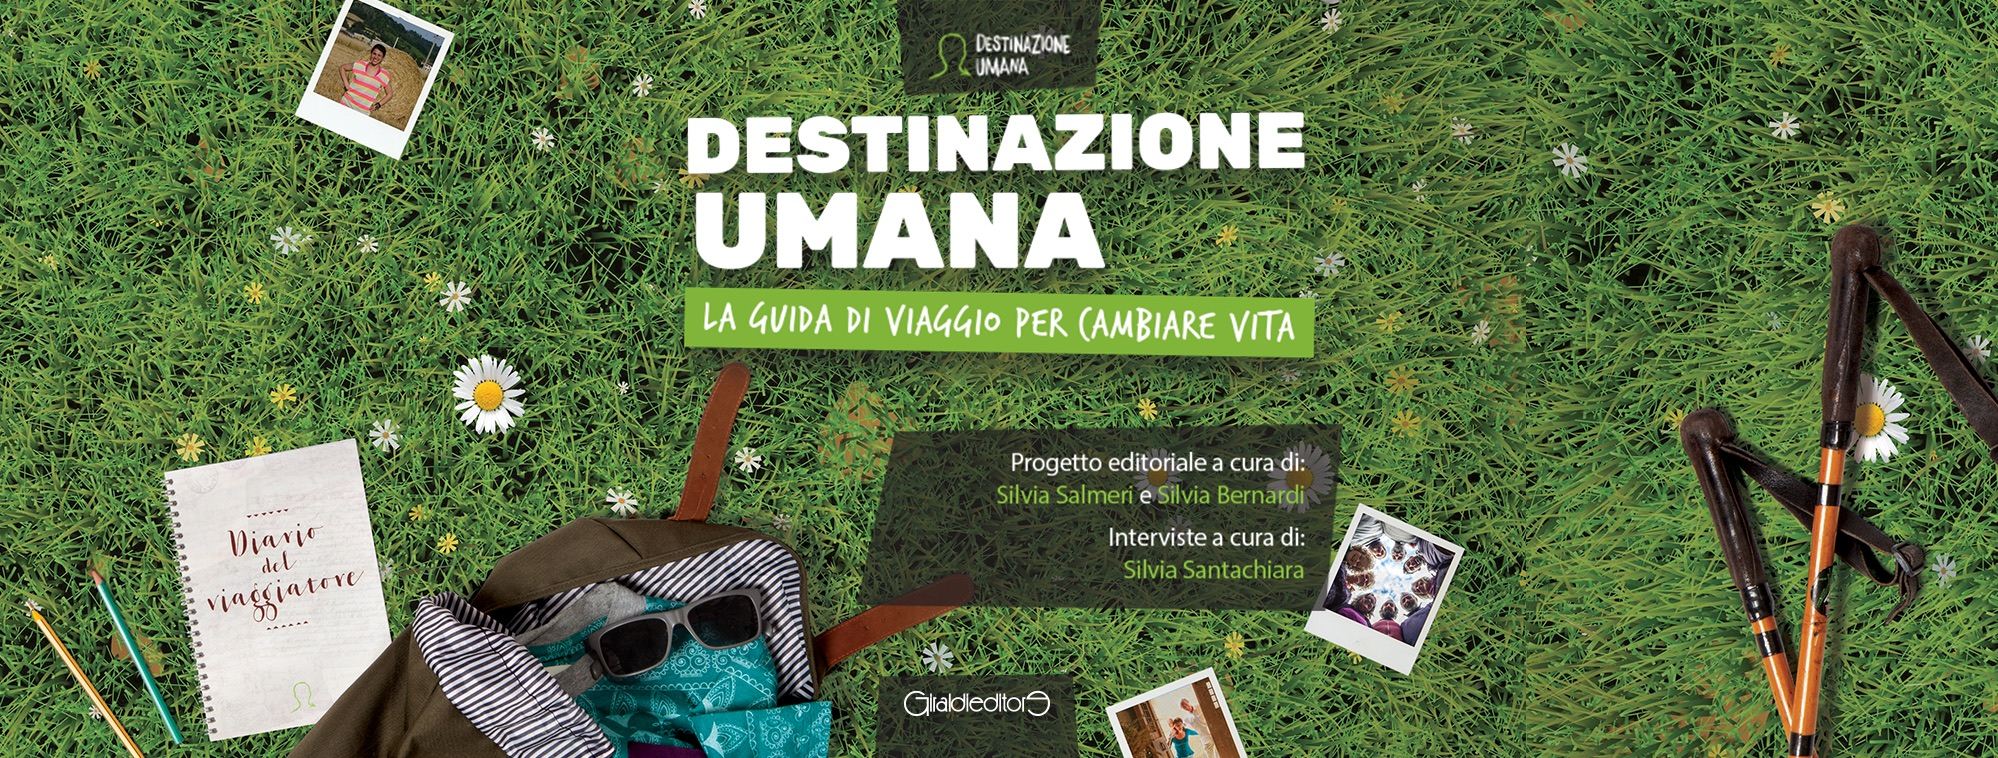 Luca Vivan, Silvia Salmeri, Silvia Santachiara, Silvia Bernardi, Destinazione Umana, guida di Destinazione Umana, turismo consapevole, Pordenone